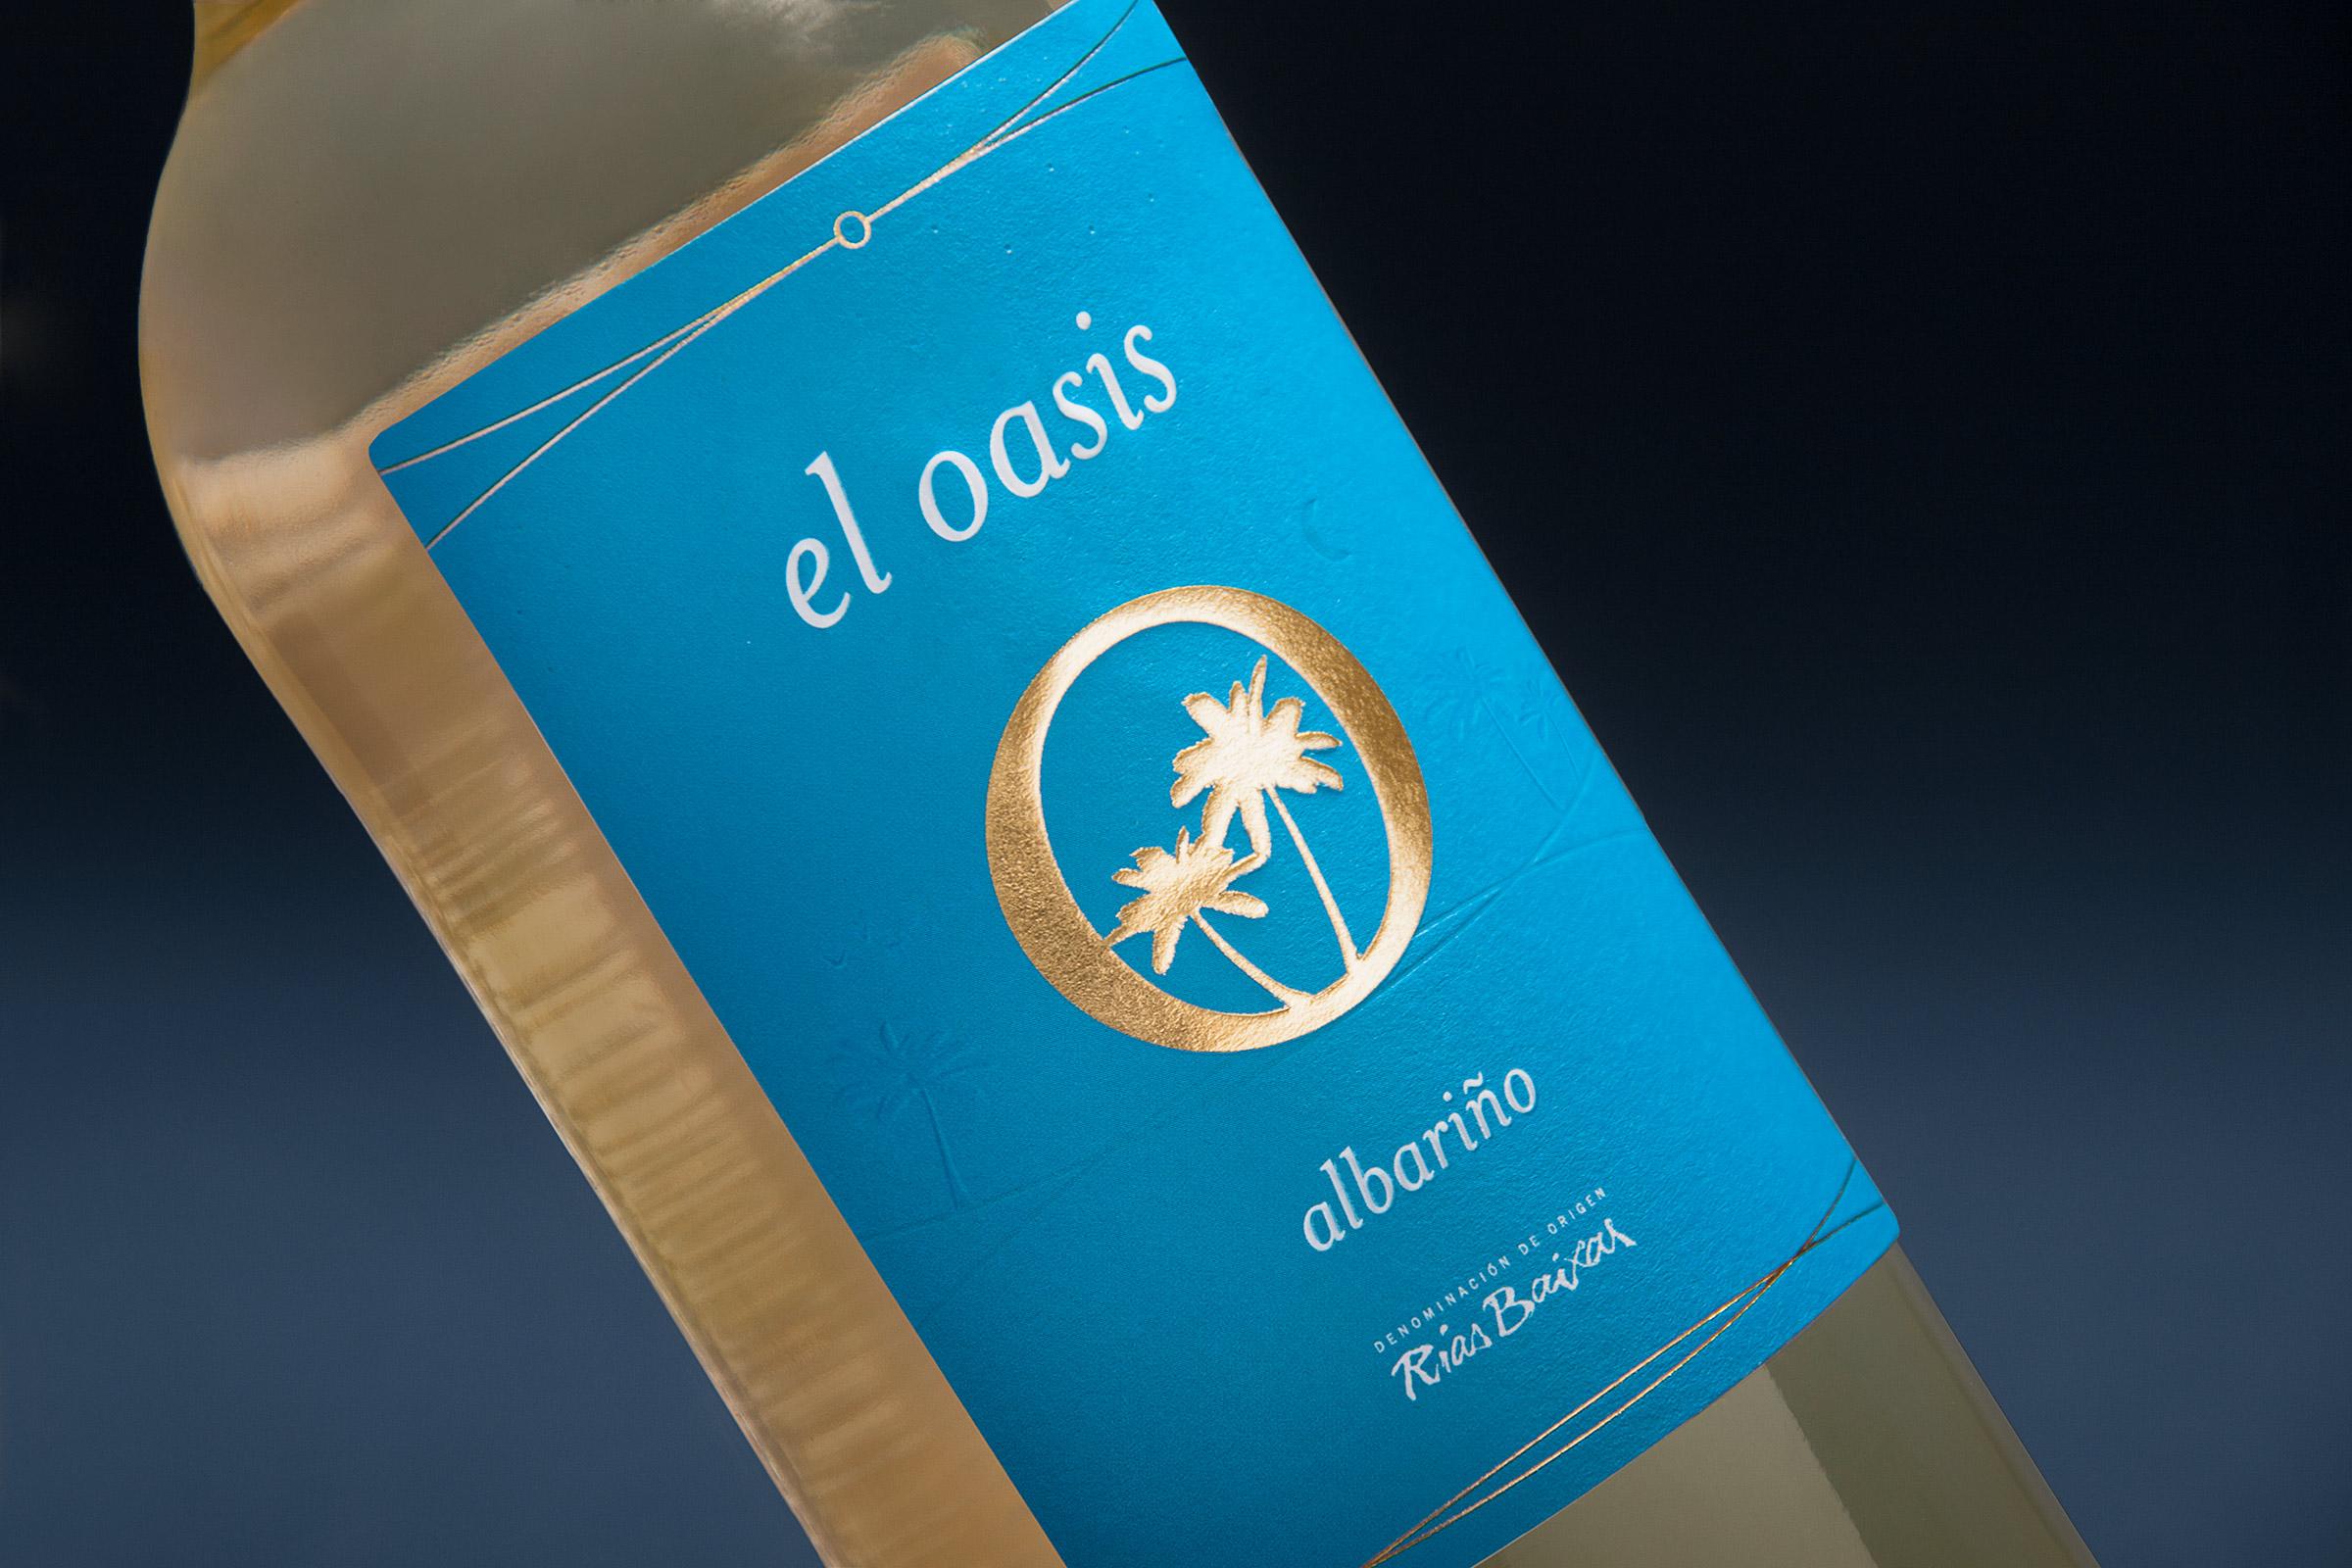 White Wine Label Design for El Oasis